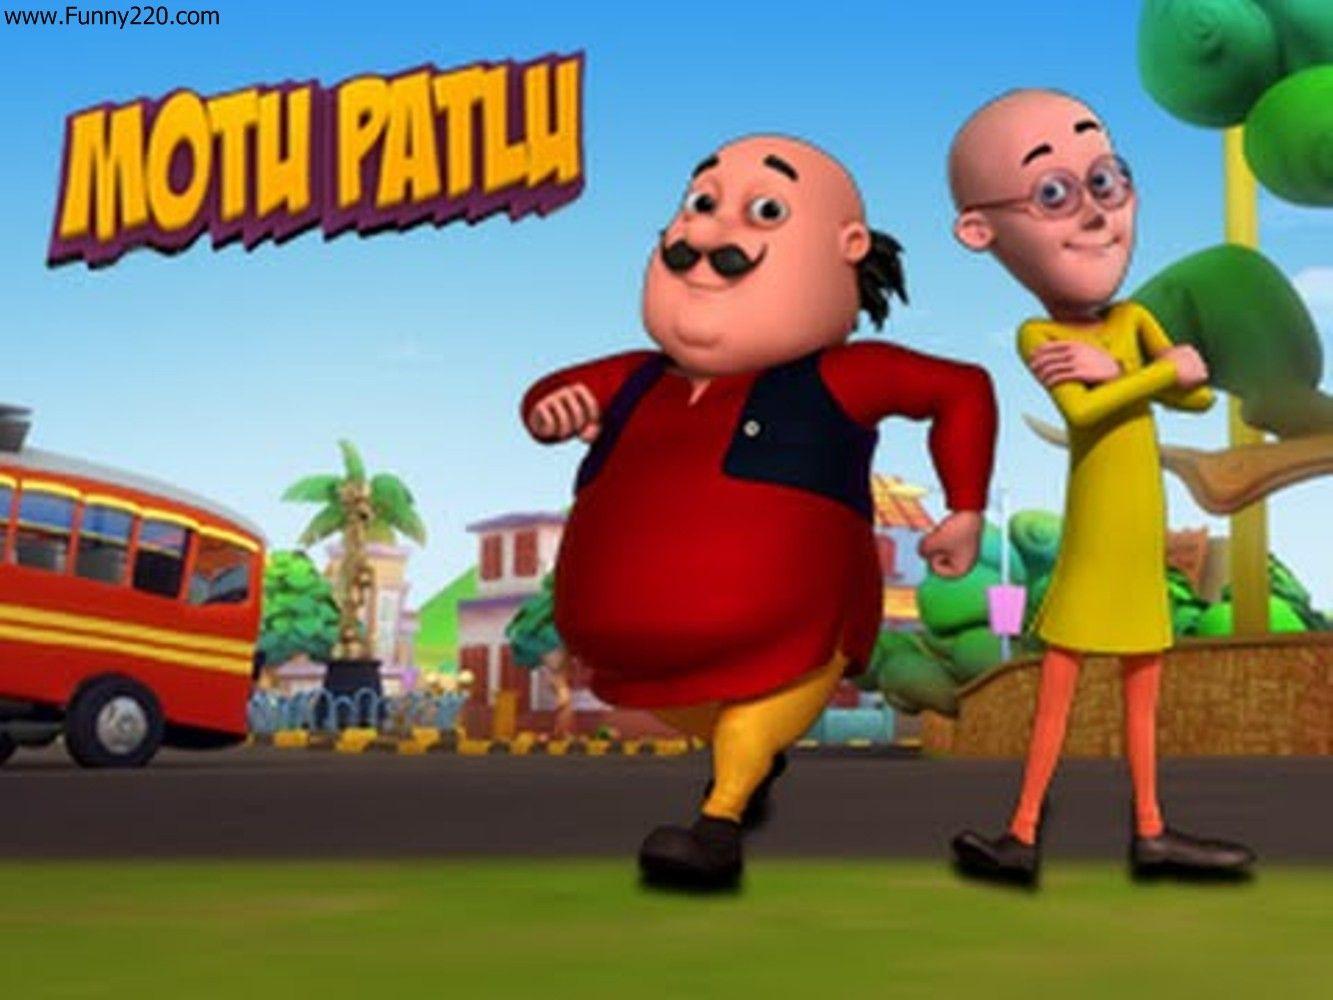 letest motu patalu hd wallpapers get free high definition cartoon